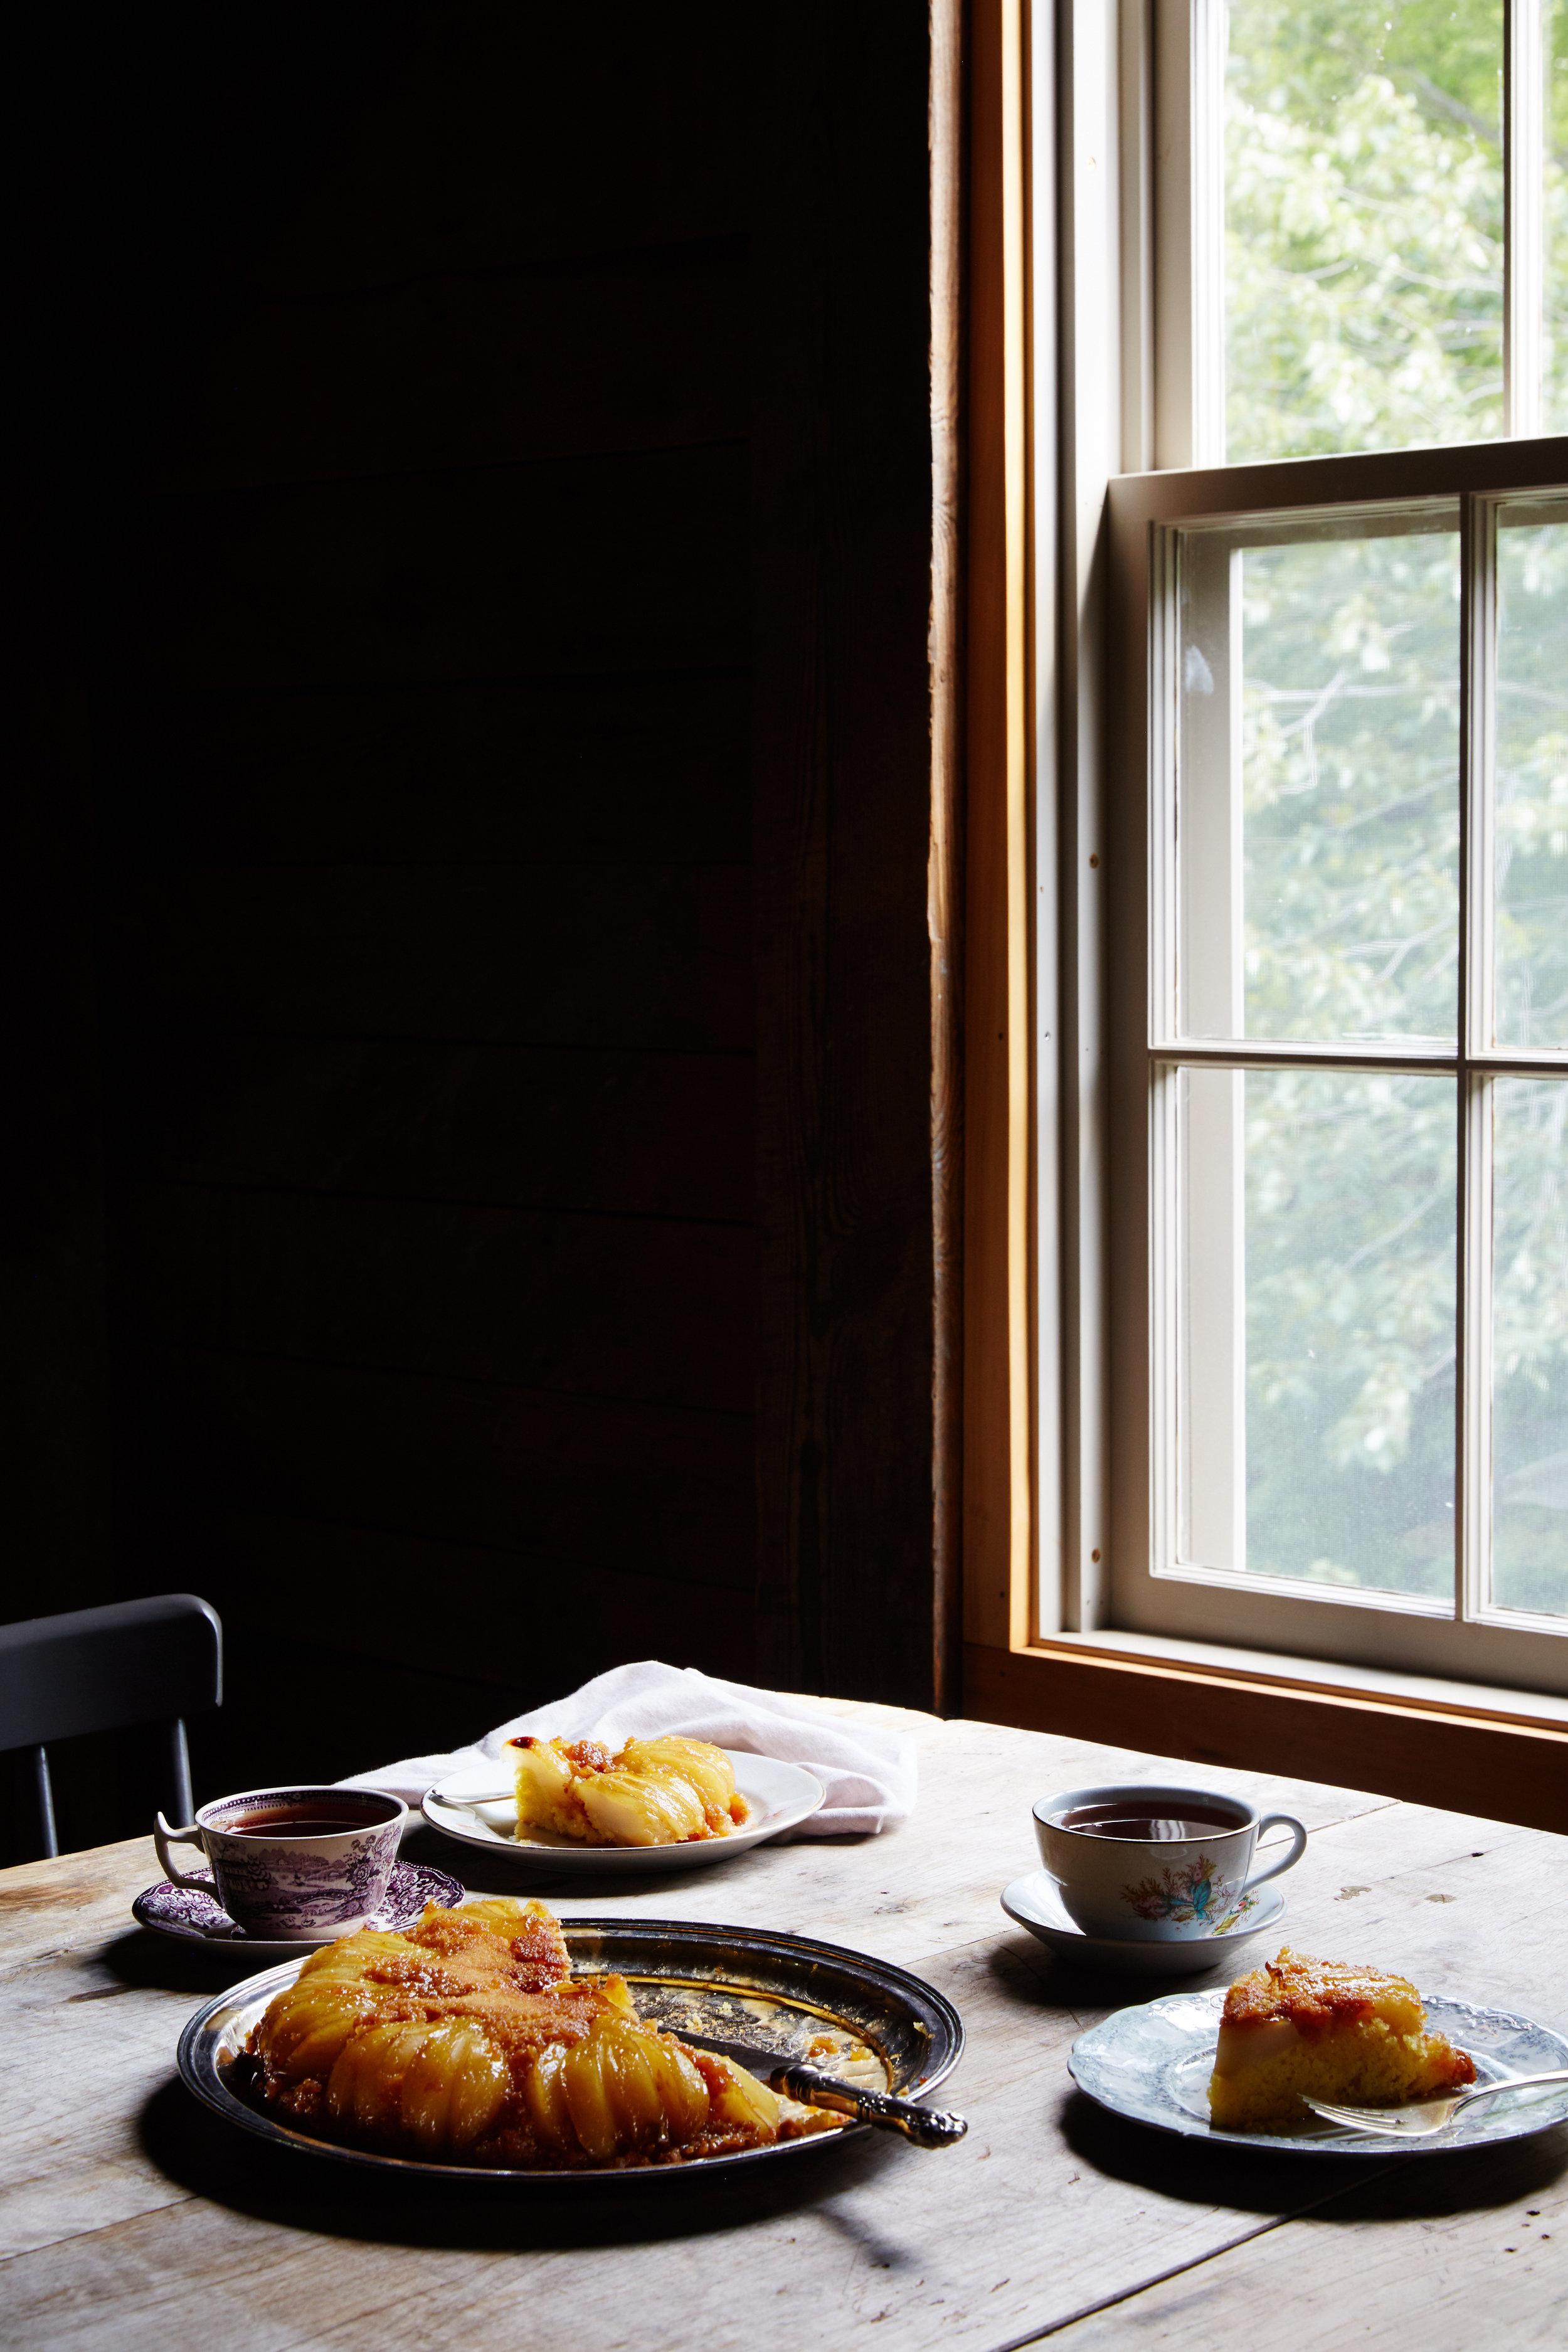 The_Lost_Kitchen_Fall_Pear_Polenta_Cake_095.jpg